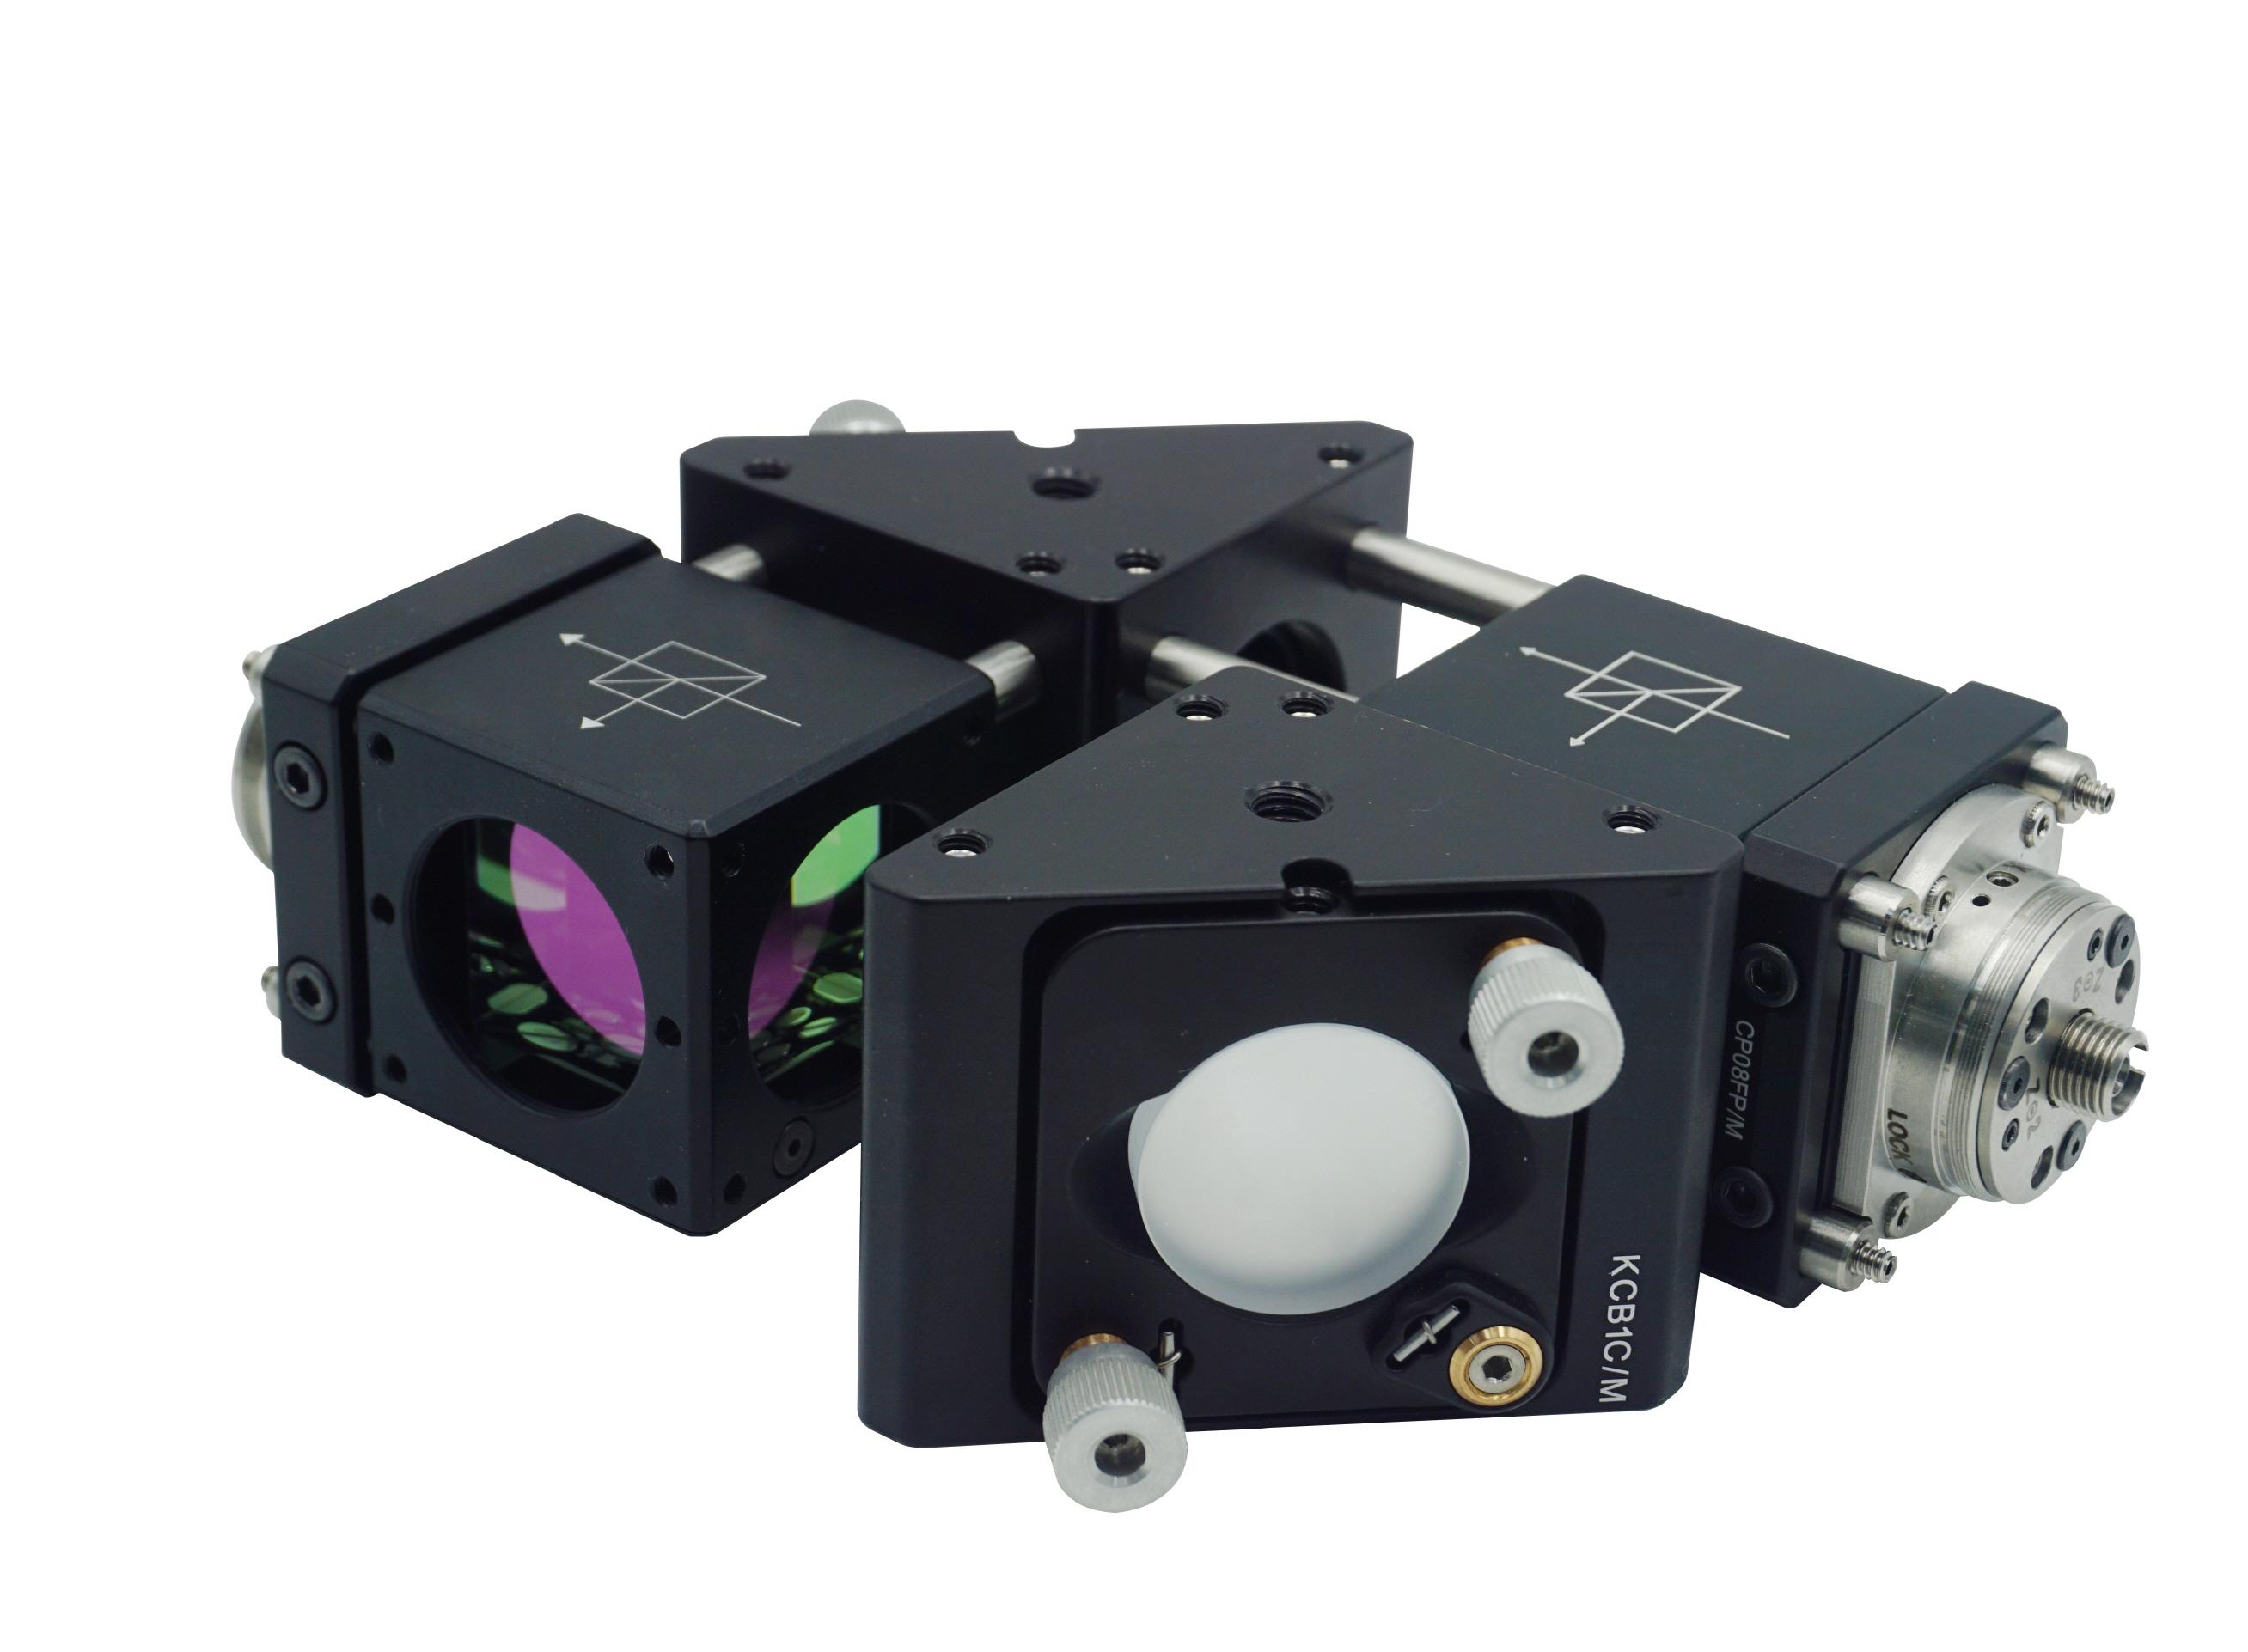 ▲  KRISS 기술을 기반으로 상용화한 '대형 유리기판 두께 및 굴절률 측정 센서' - 한국표준과학연구원